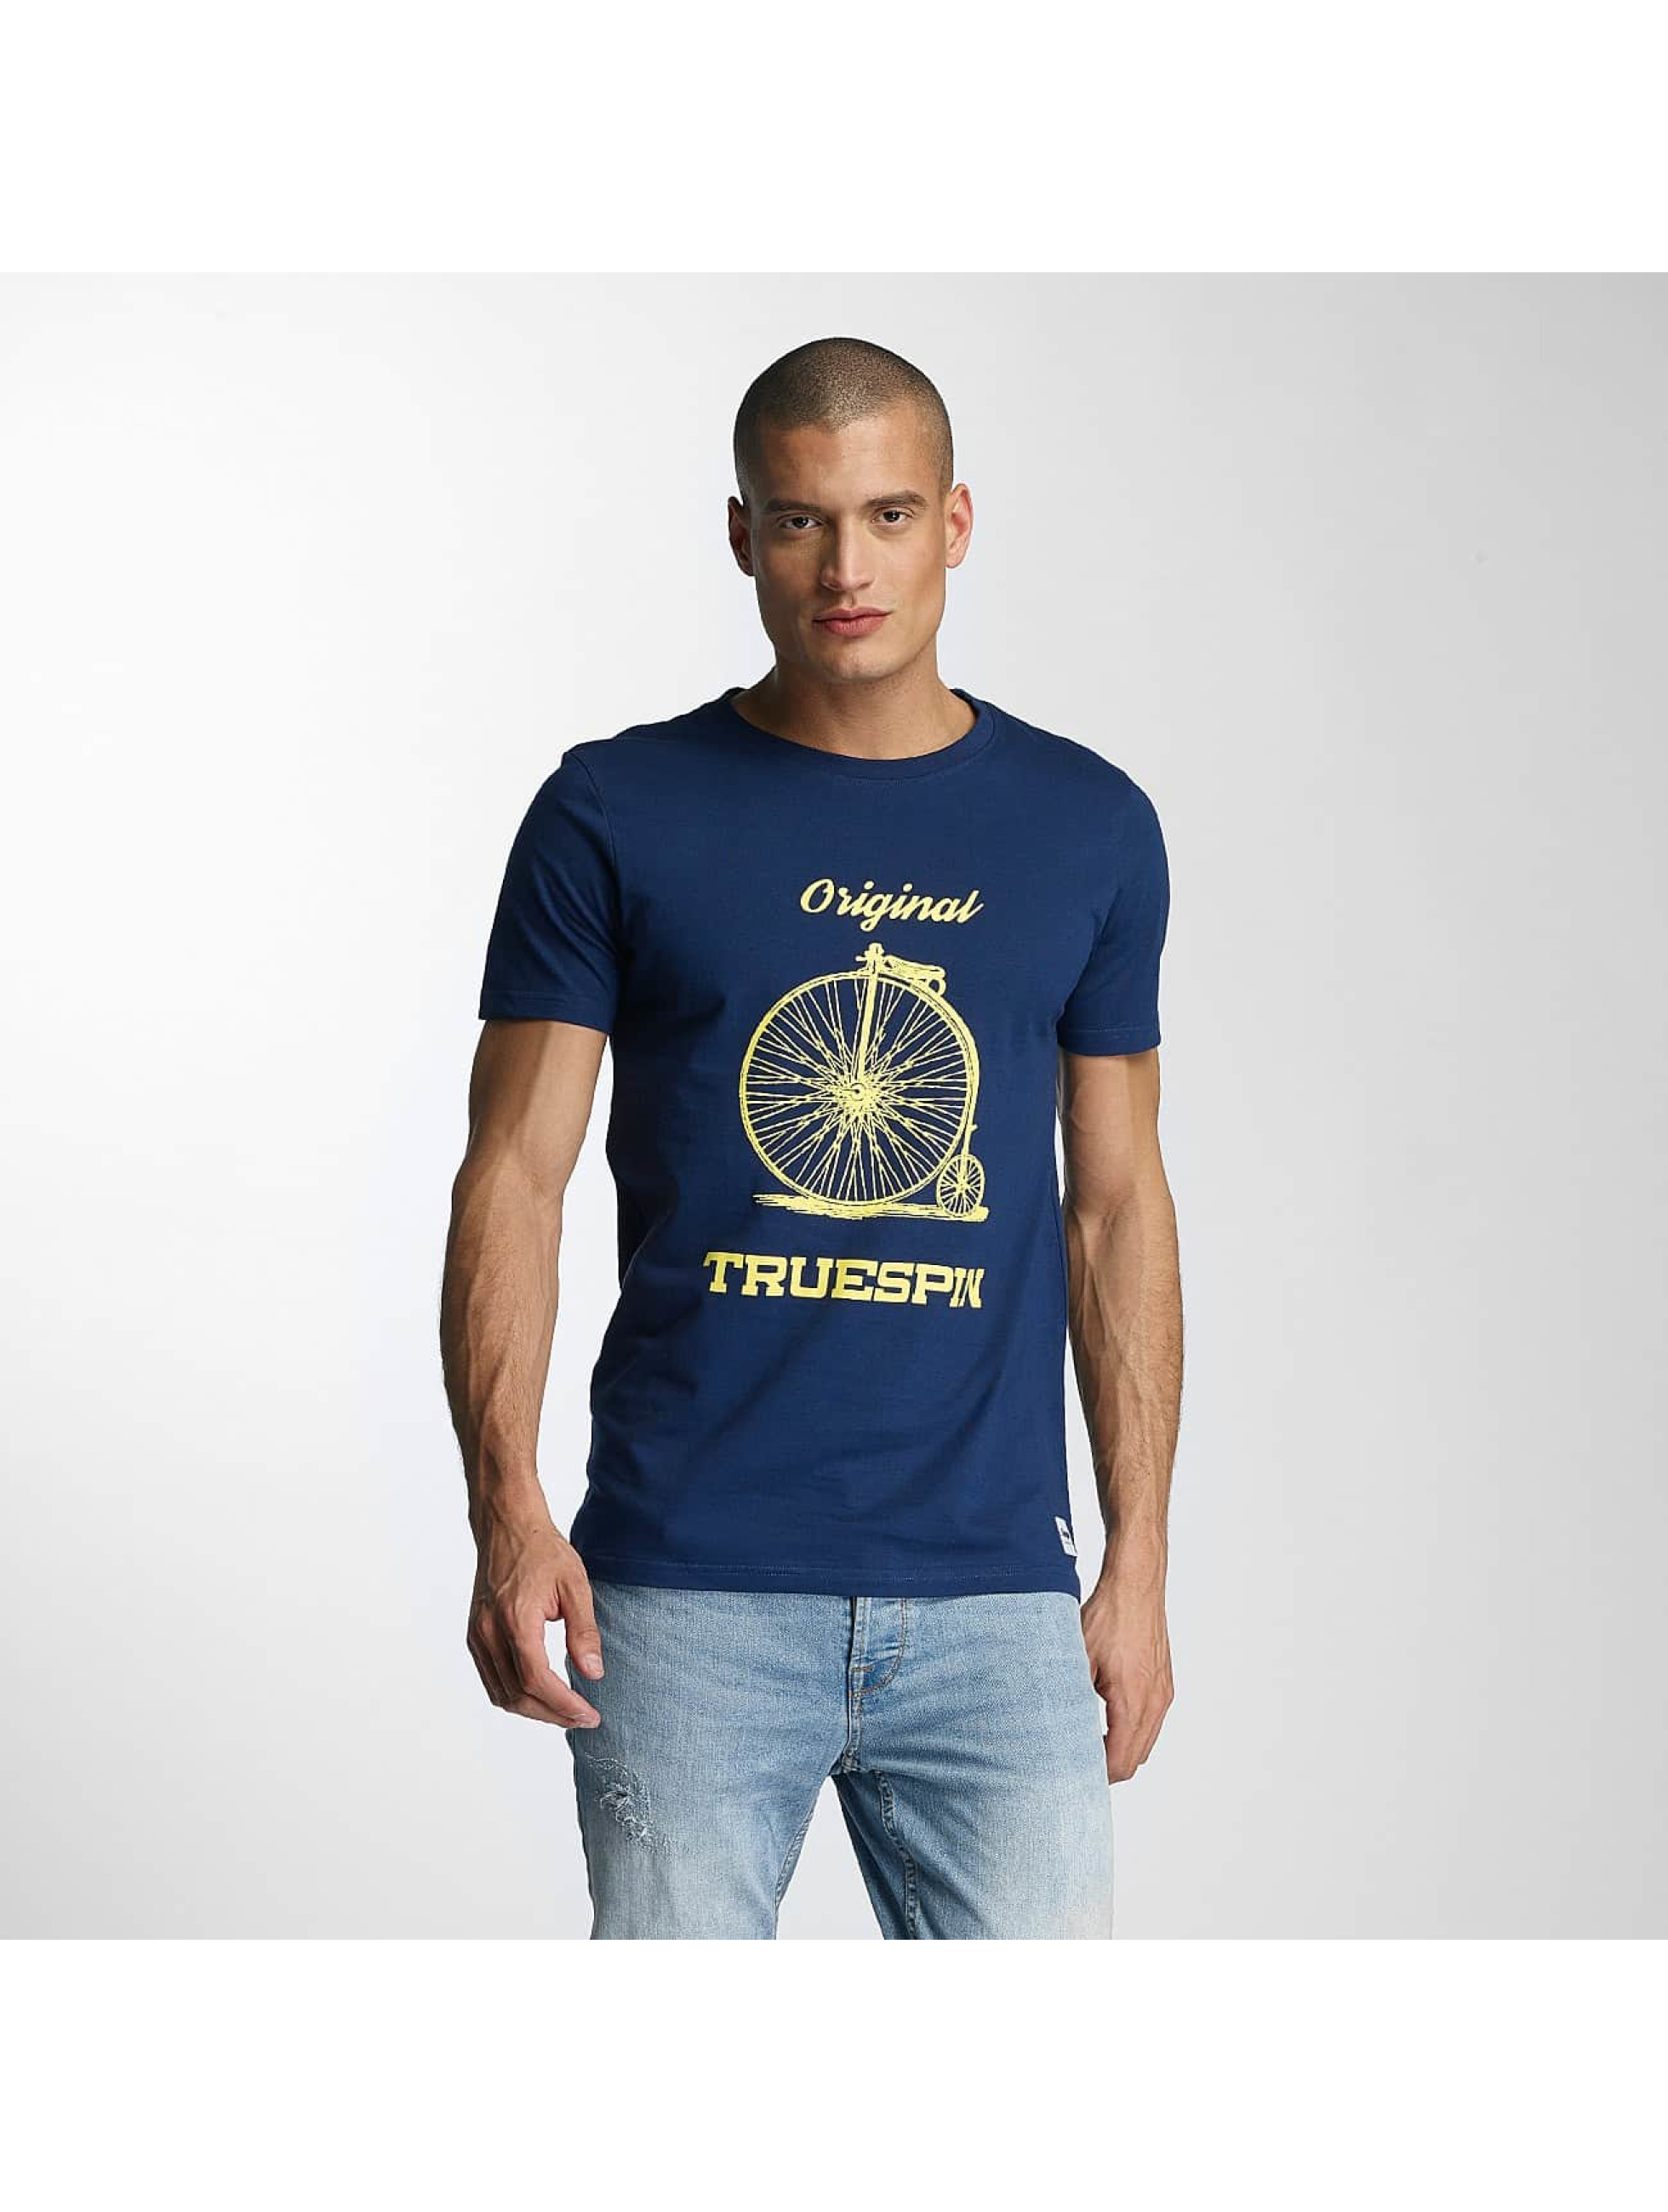 TrueSpin Camiseta 6 azul